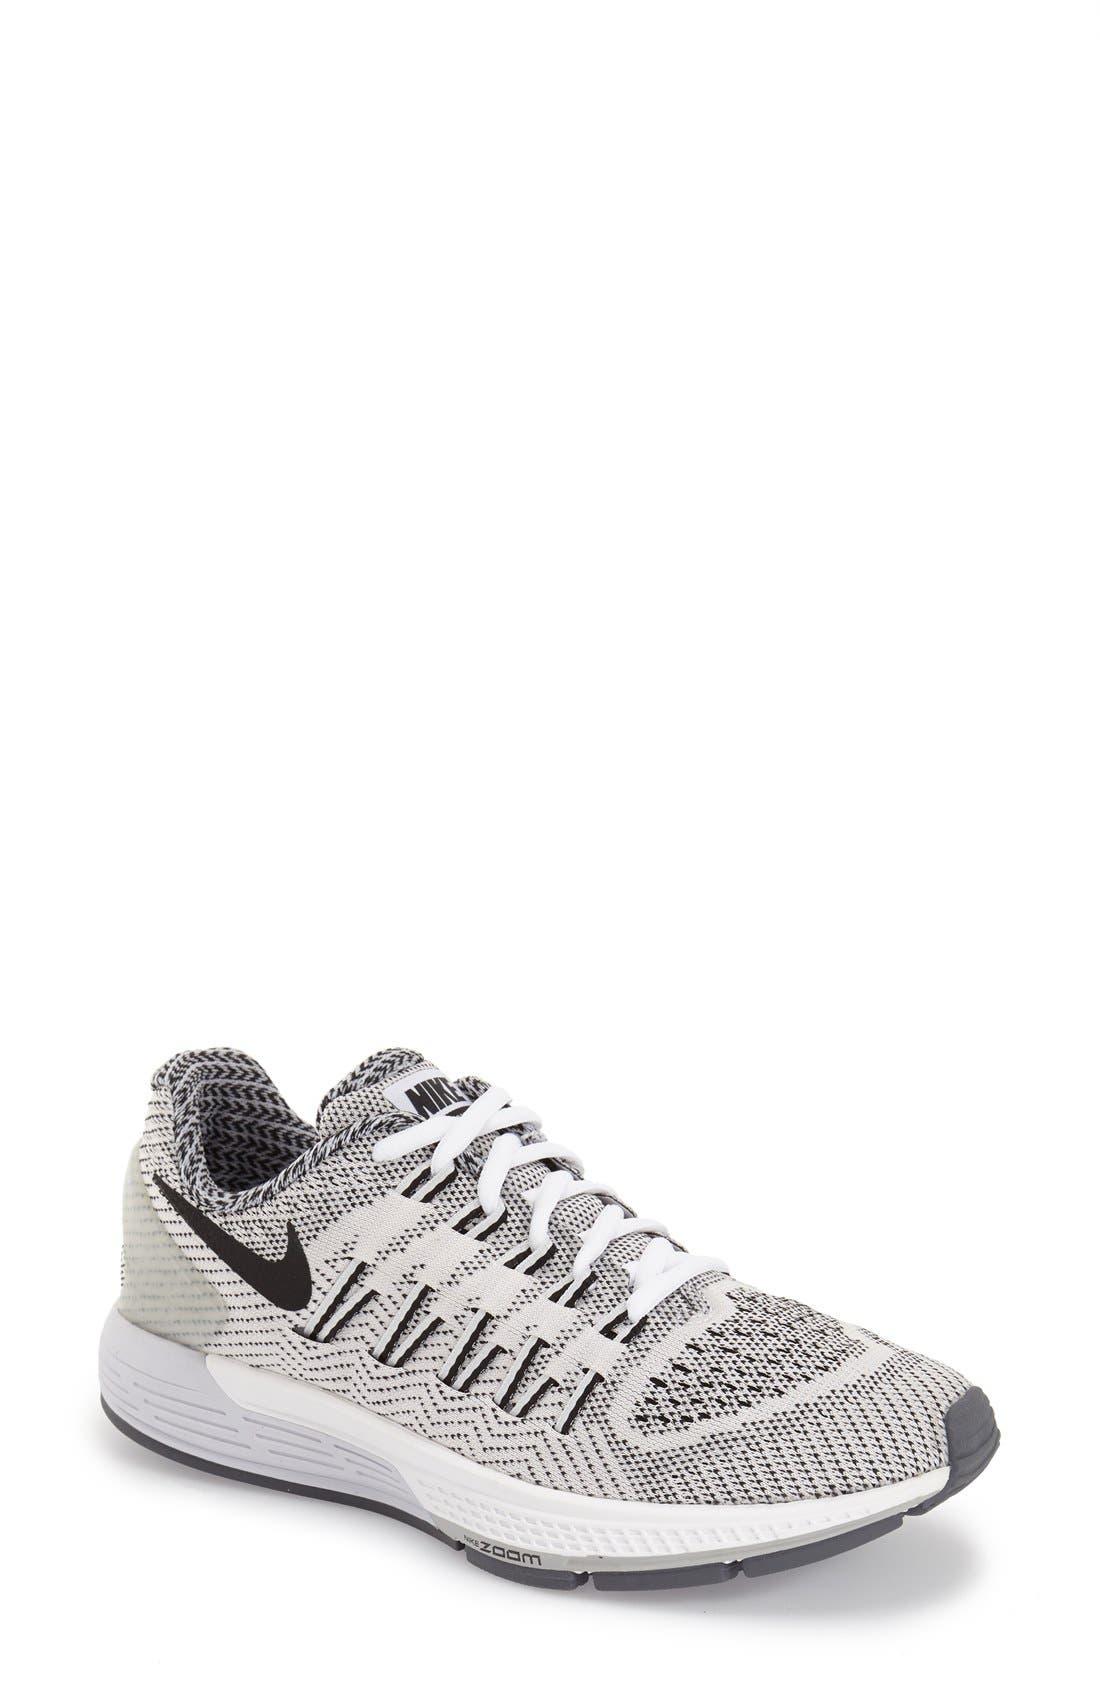 Main Image - Nike 'Air Zoom Odyssey' Running Shoe (Women)